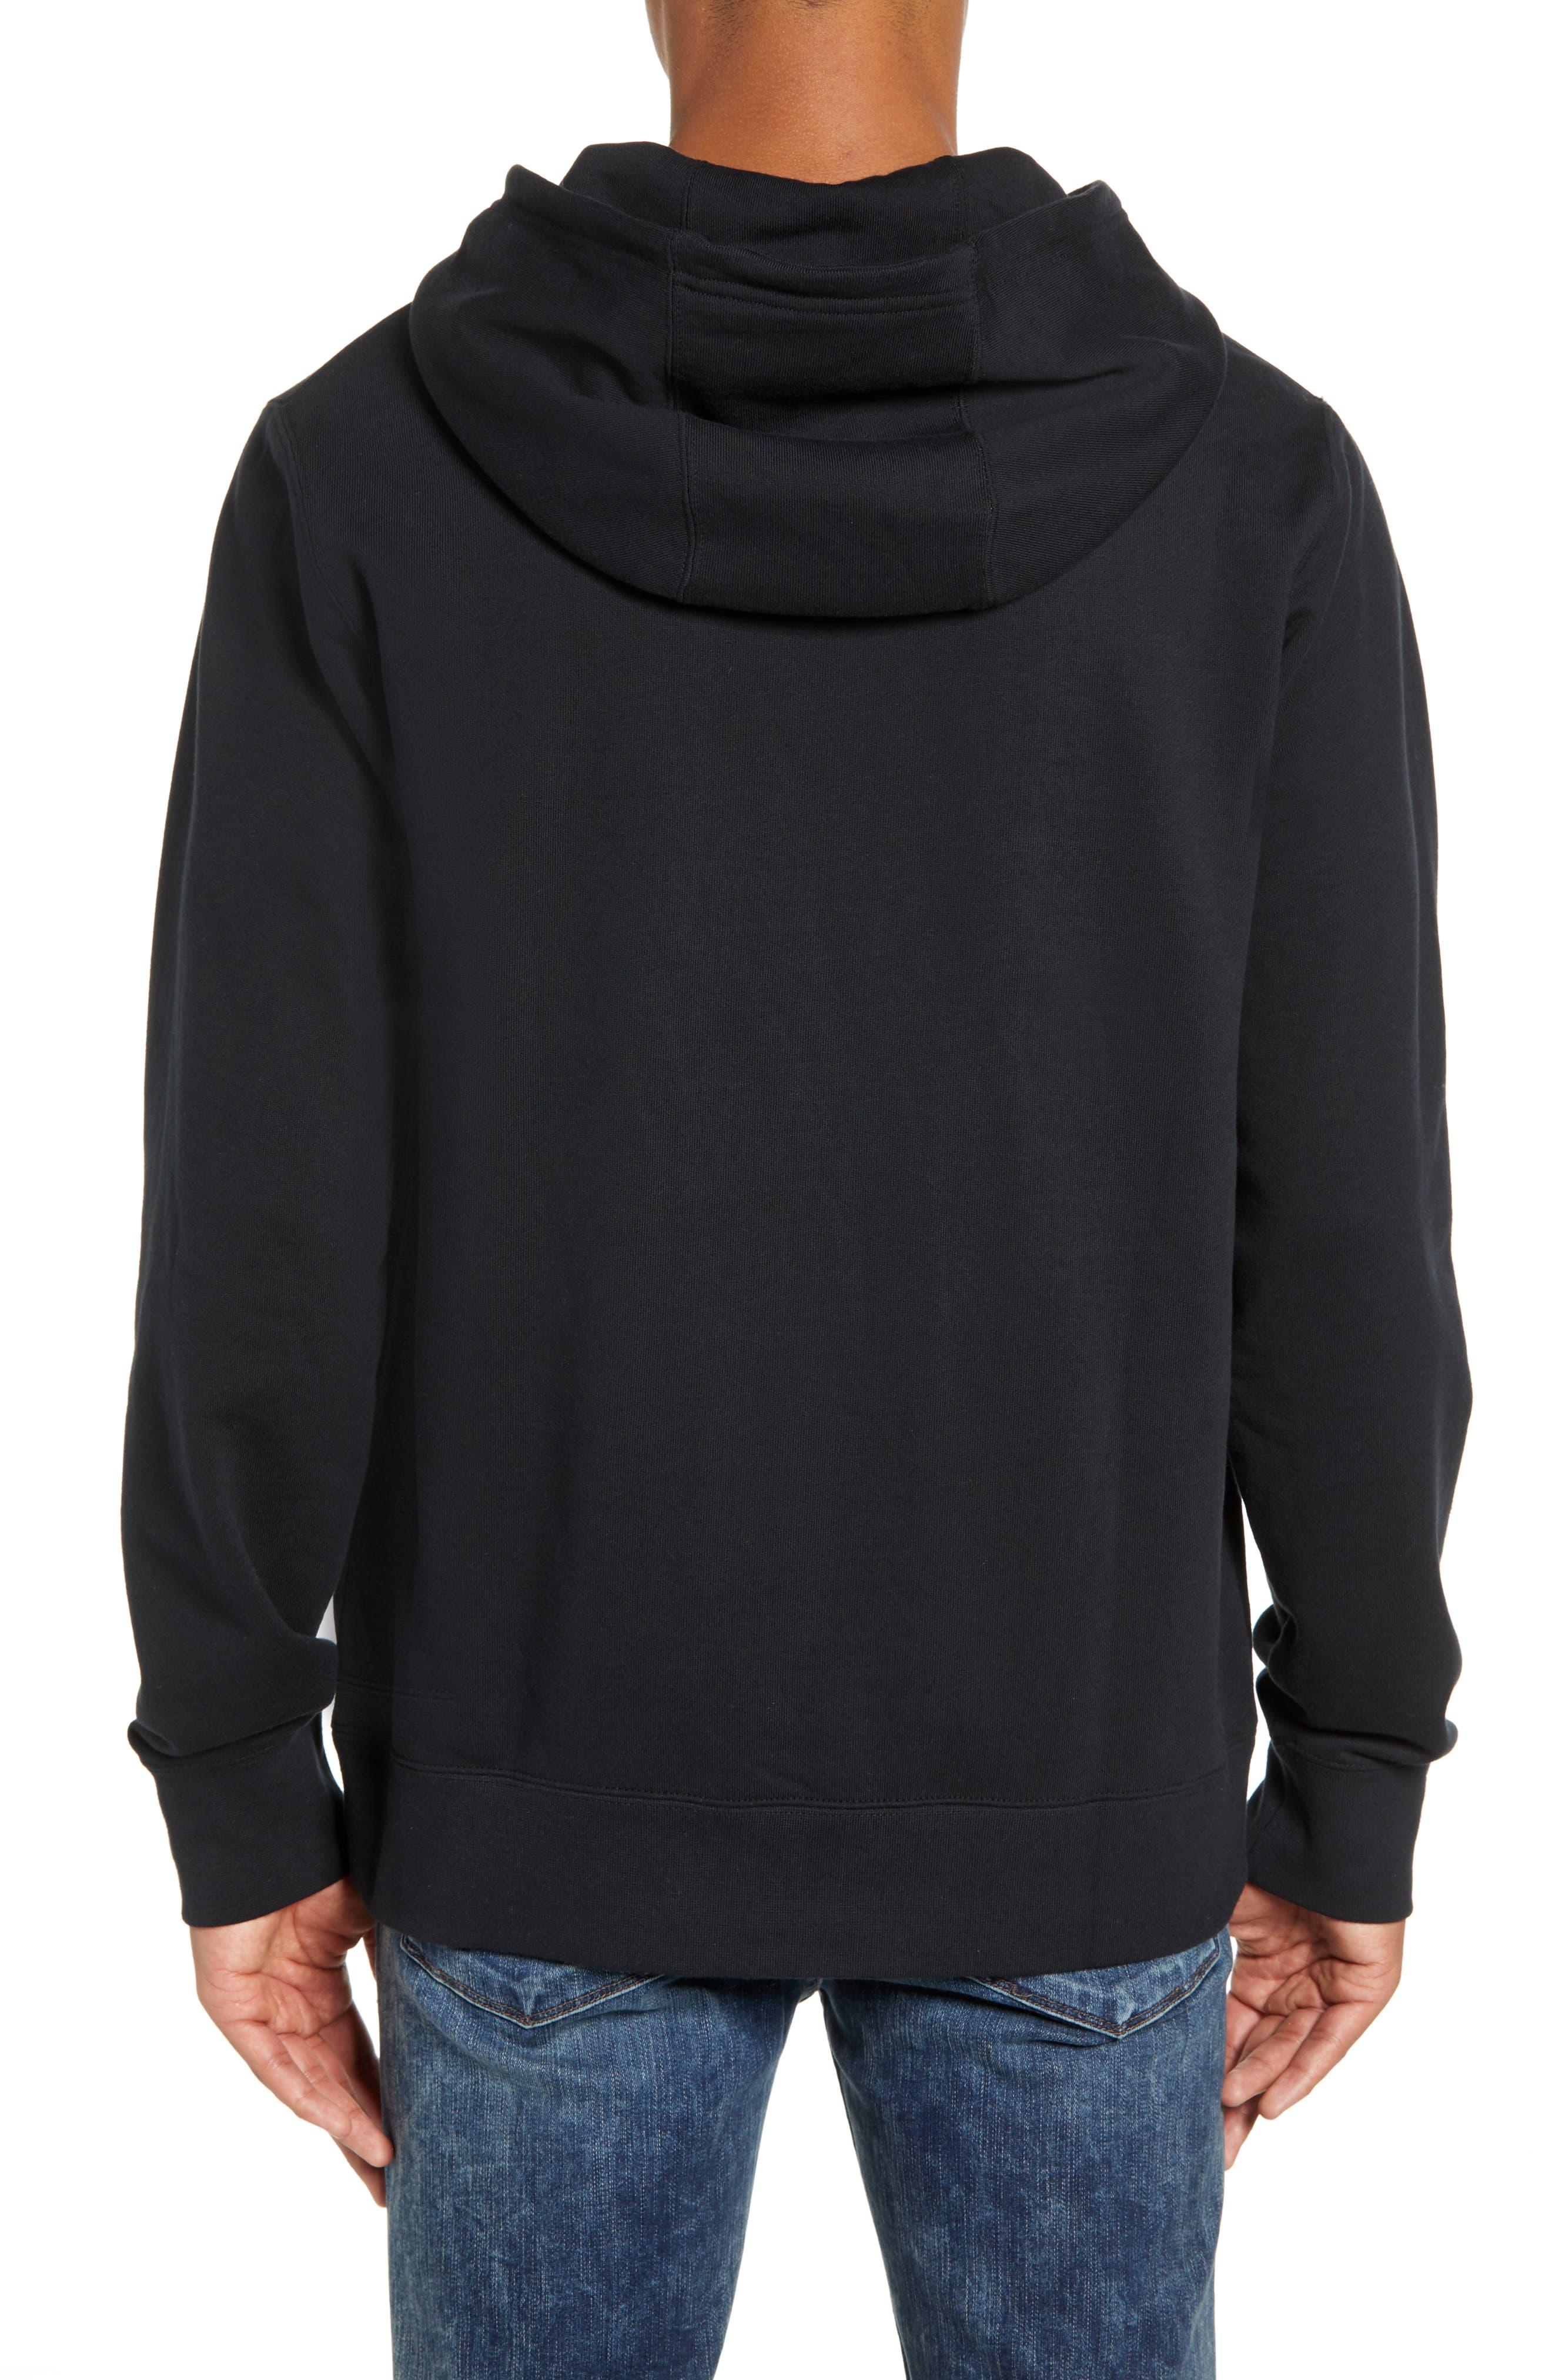 Sportswear ACG Pullover Hoodie,                             Alternate thumbnail 2, color,                             BLACK/ BLACK